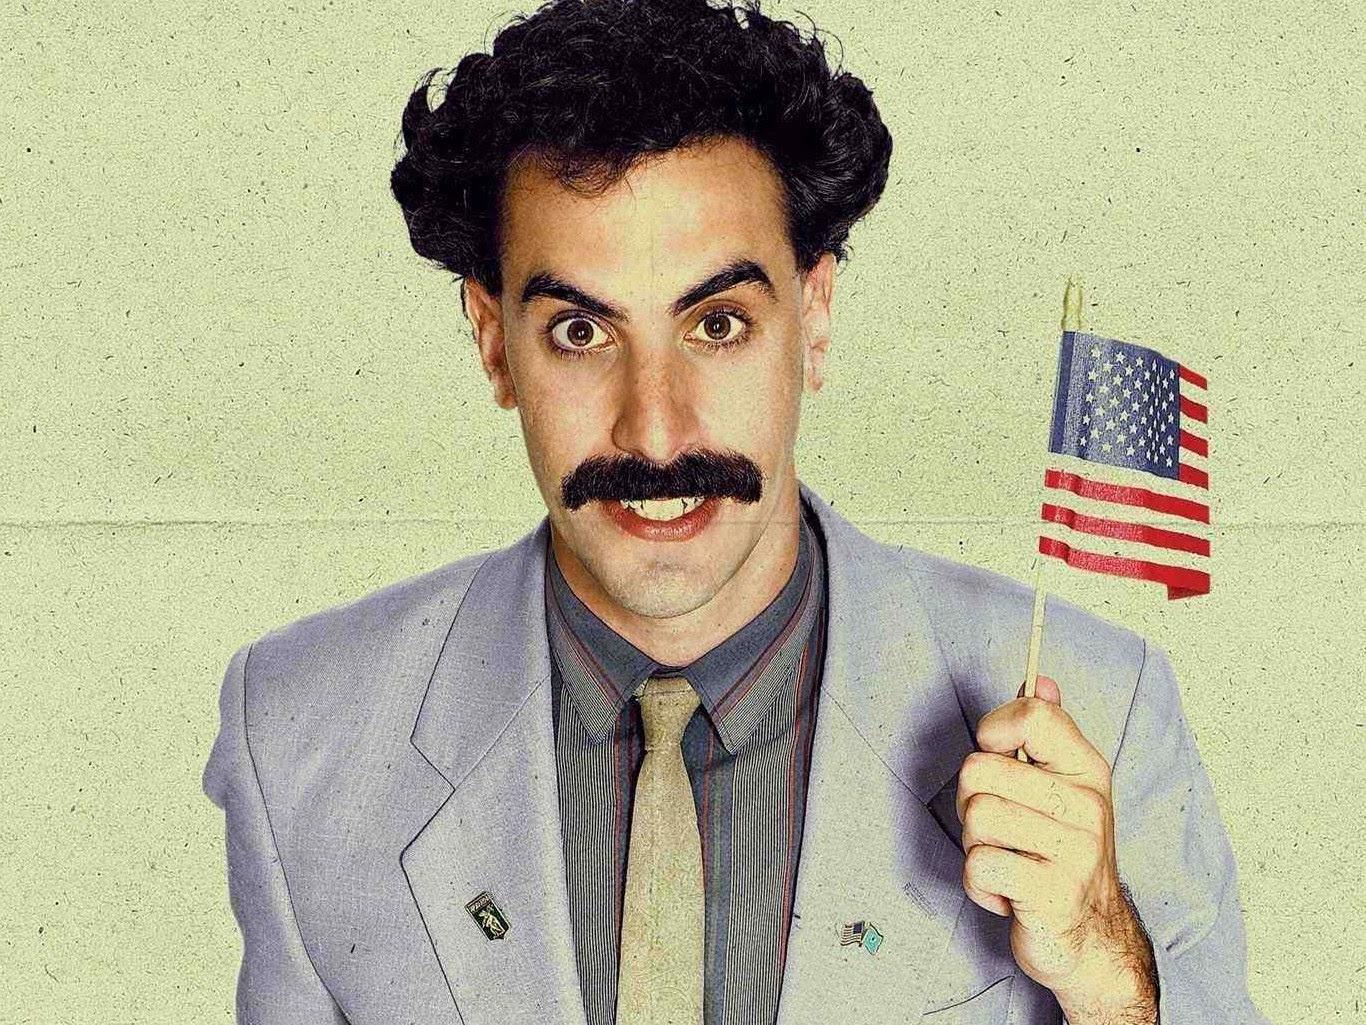 Borat A Very Very Nice Comedy Cinematic